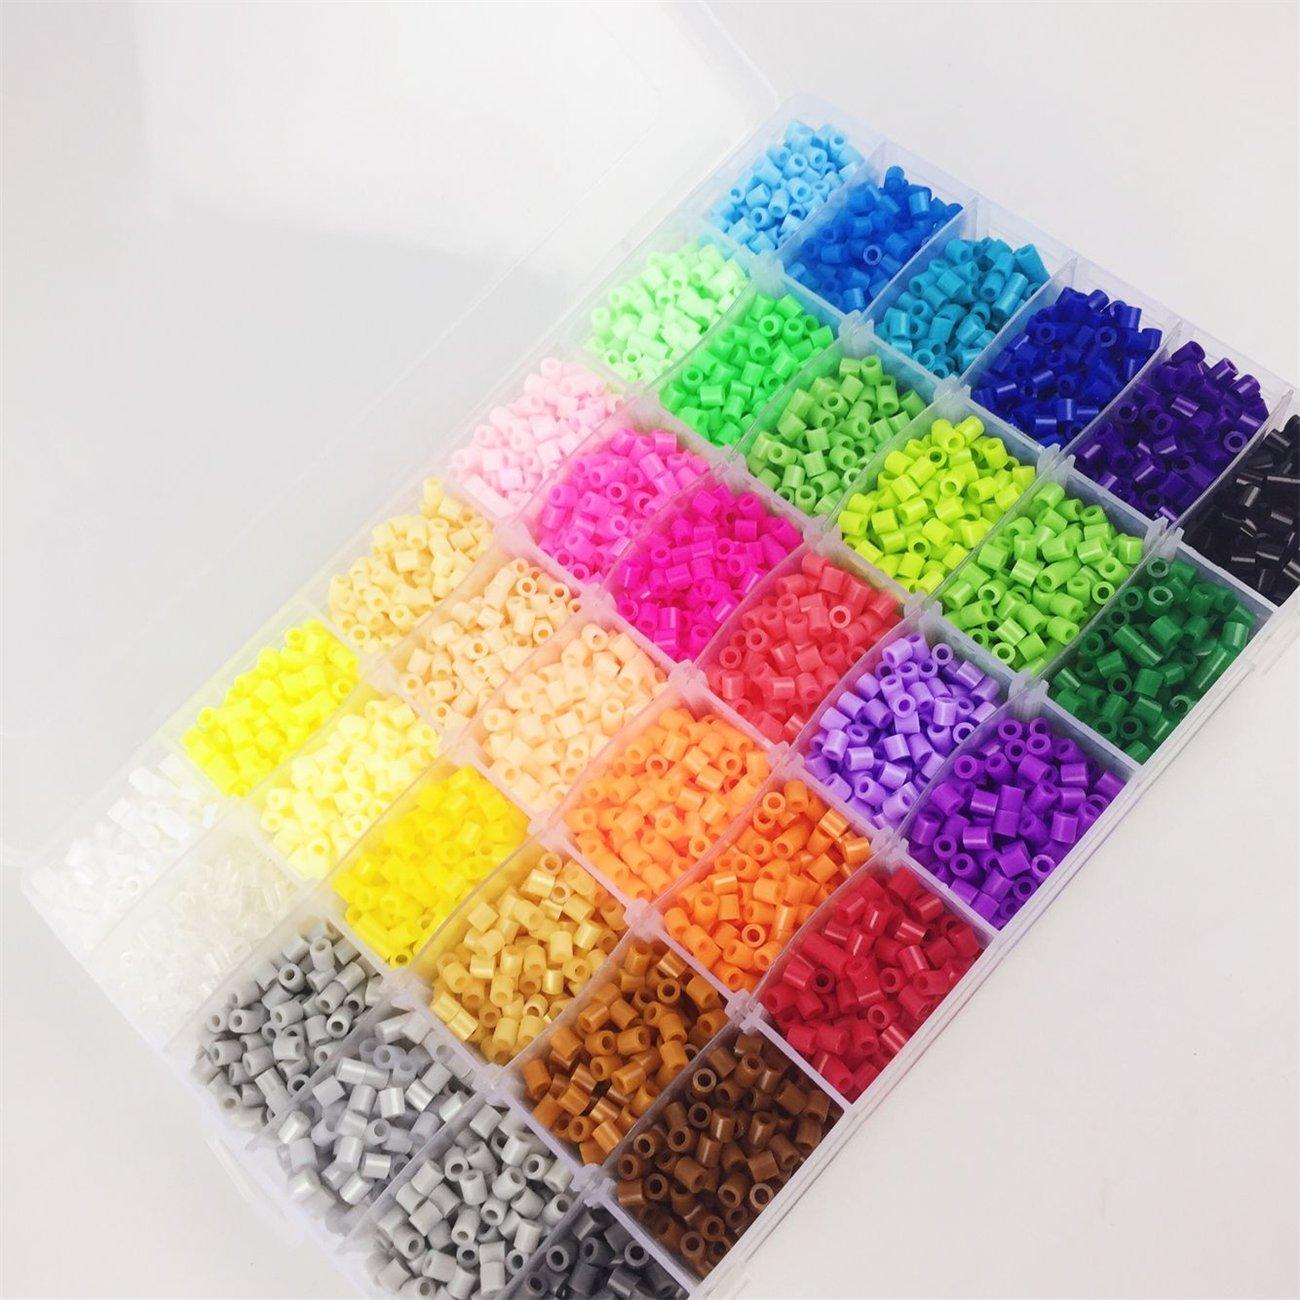 Juguetes para bebés color de los granos DIY de Perler PC caja